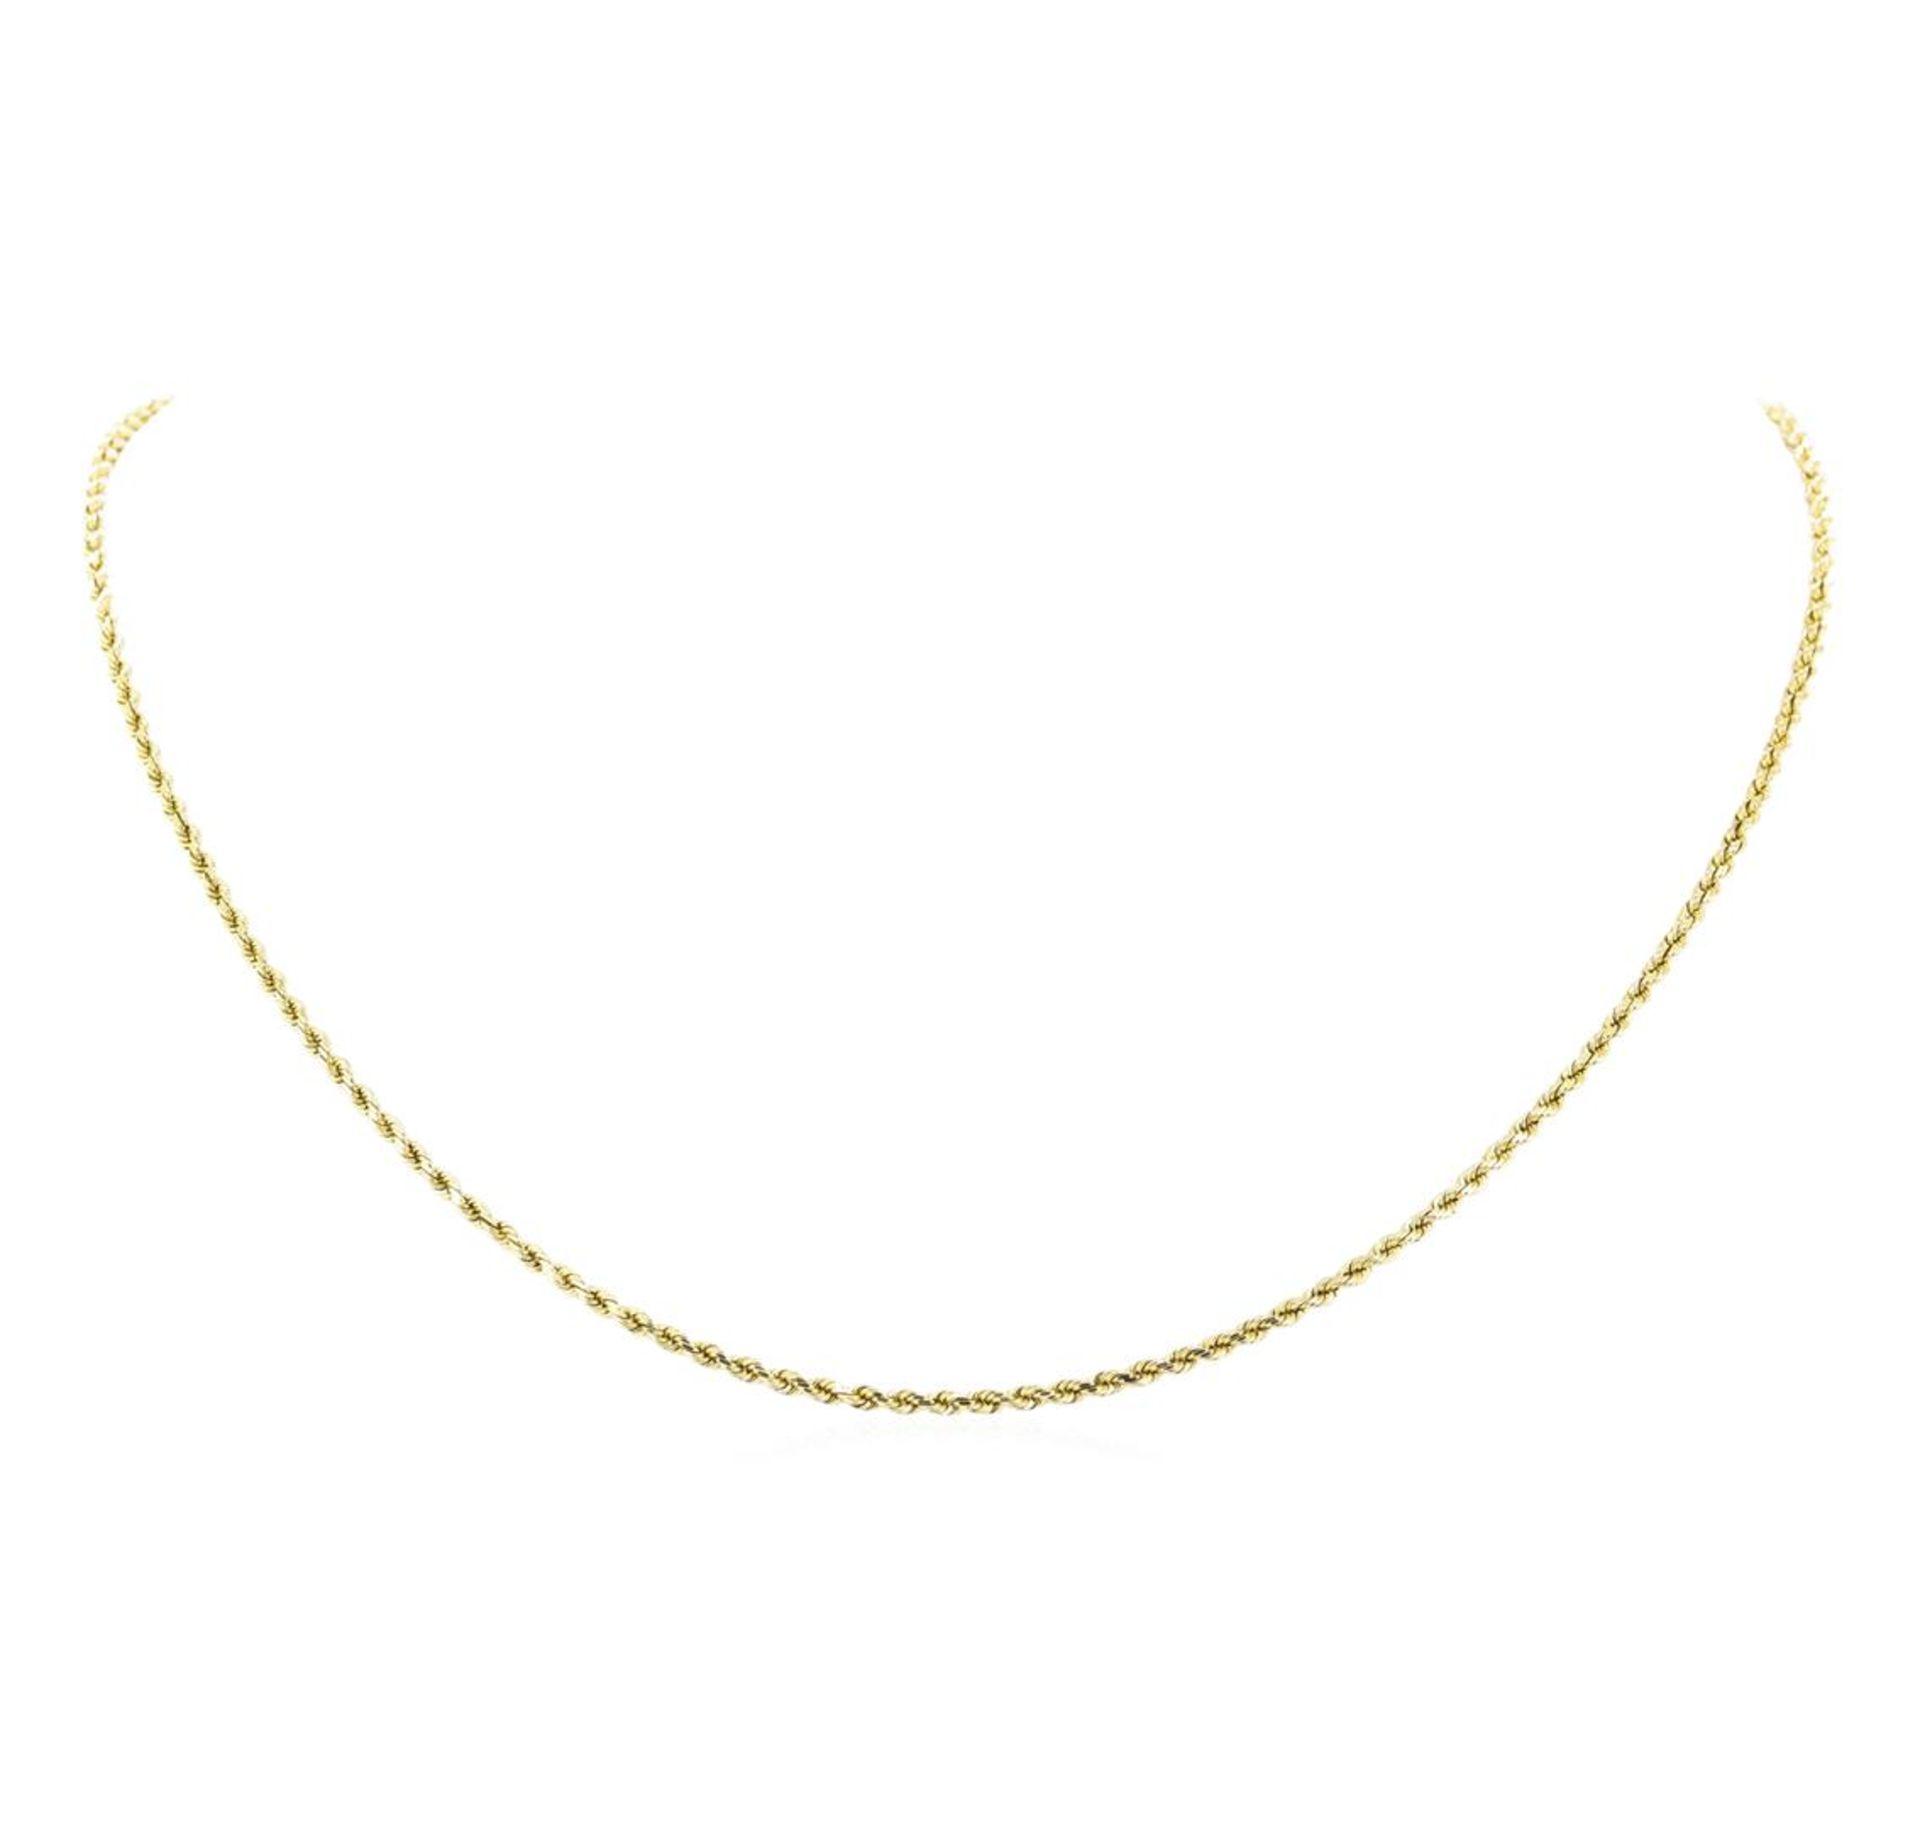 Twenty Inch Rope Chain - 14KT Yellow Gold